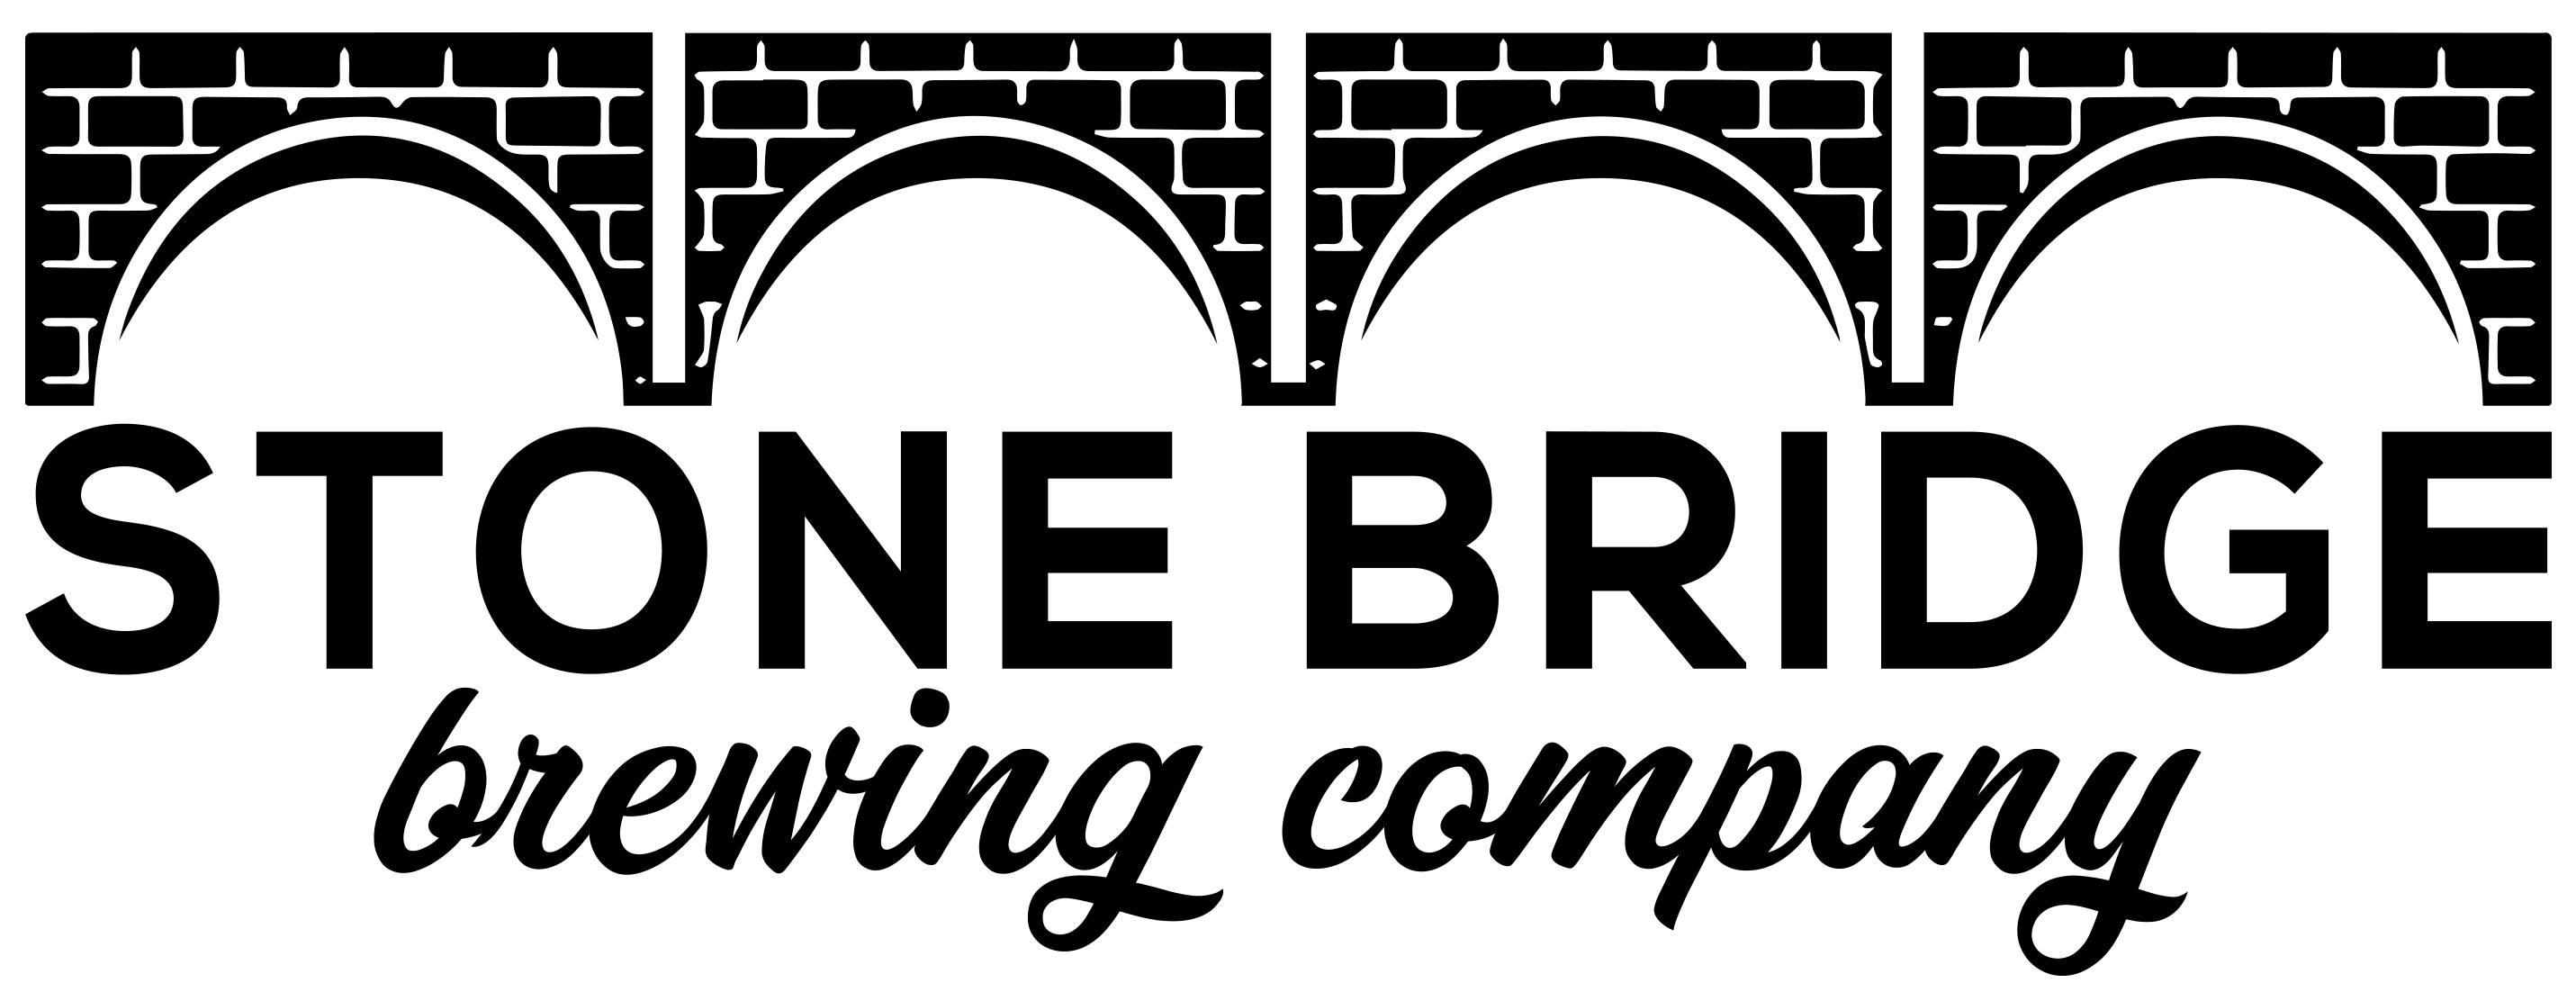 Stone Bridge Brewing Company logo